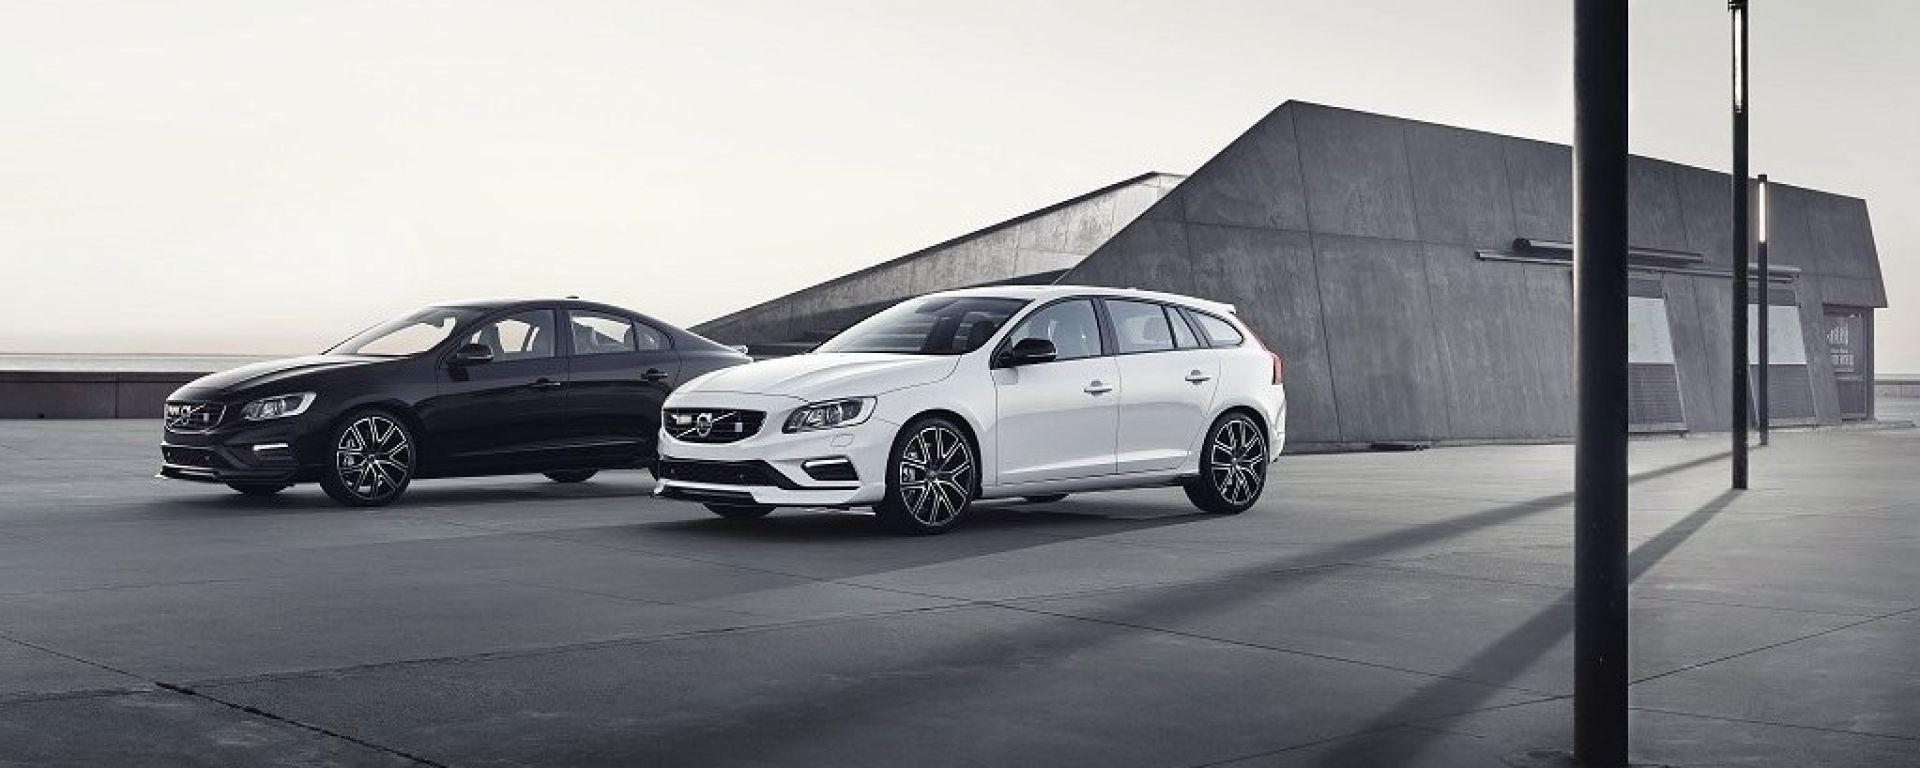 Volvo S60 e V60 Polestar: ecco i model year 2017